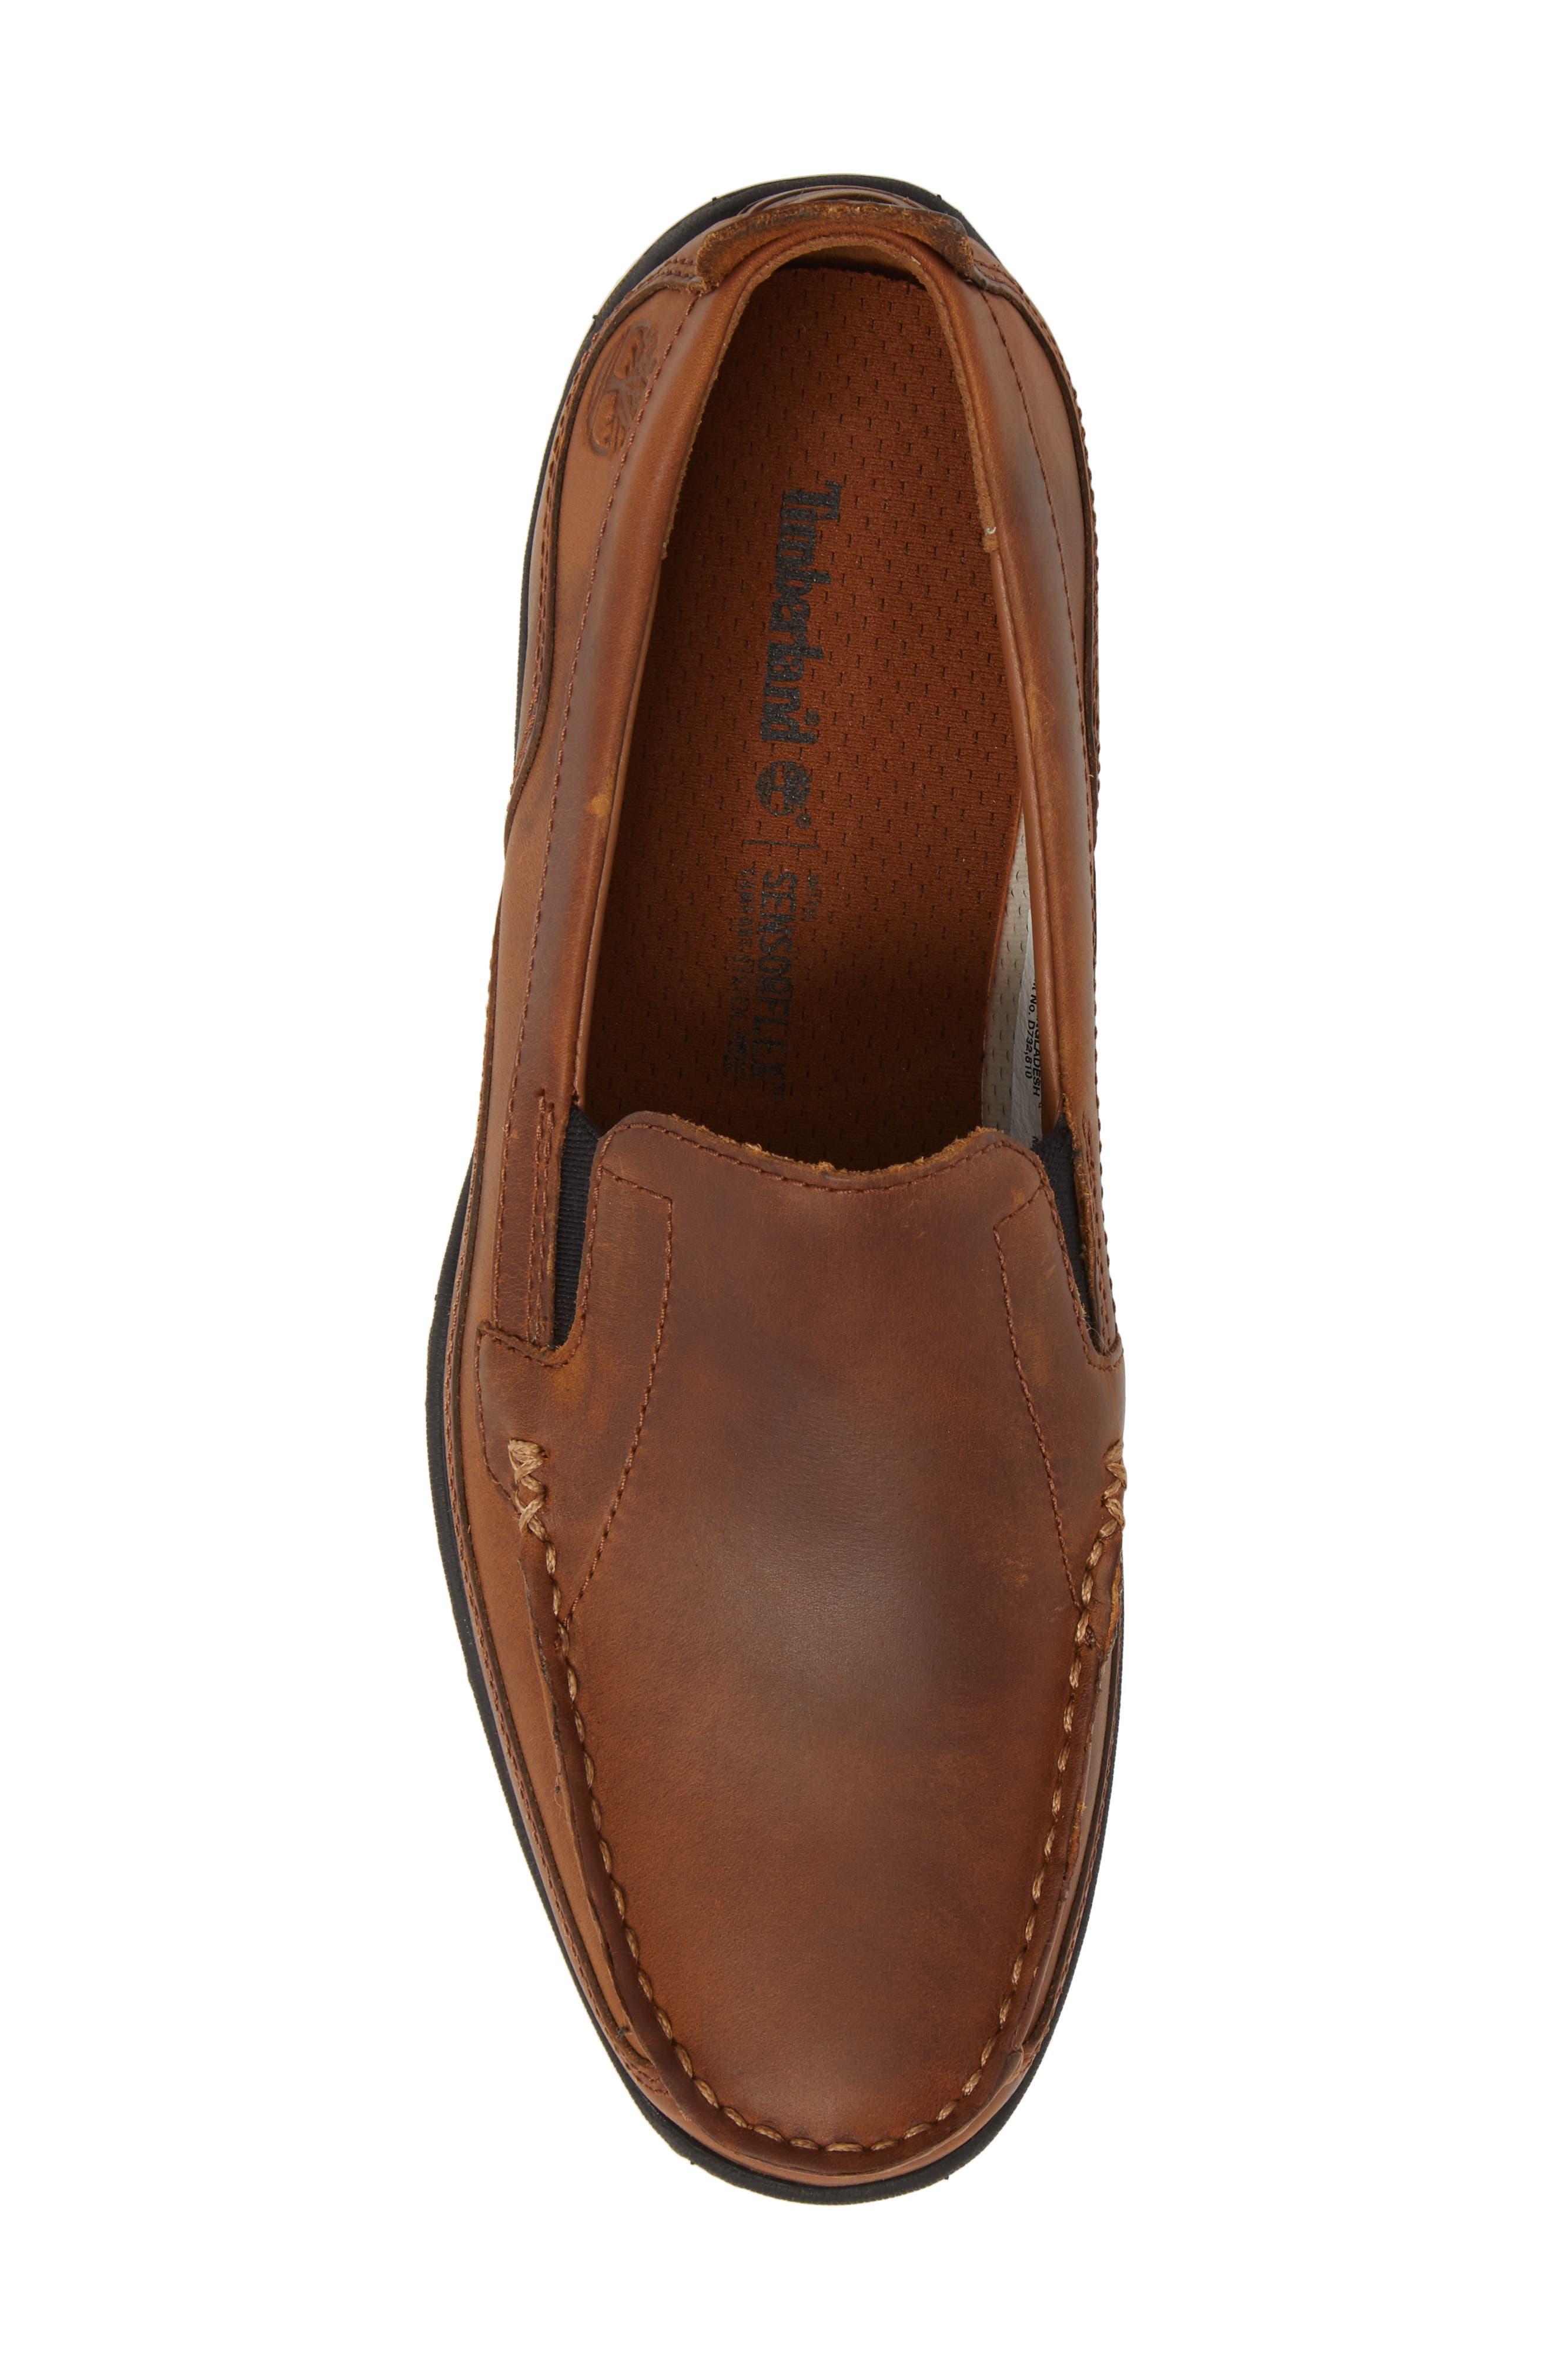 Sandspoint Venetian Loafer,                             Alternate thumbnail 5, color,                             Tan Old Harness